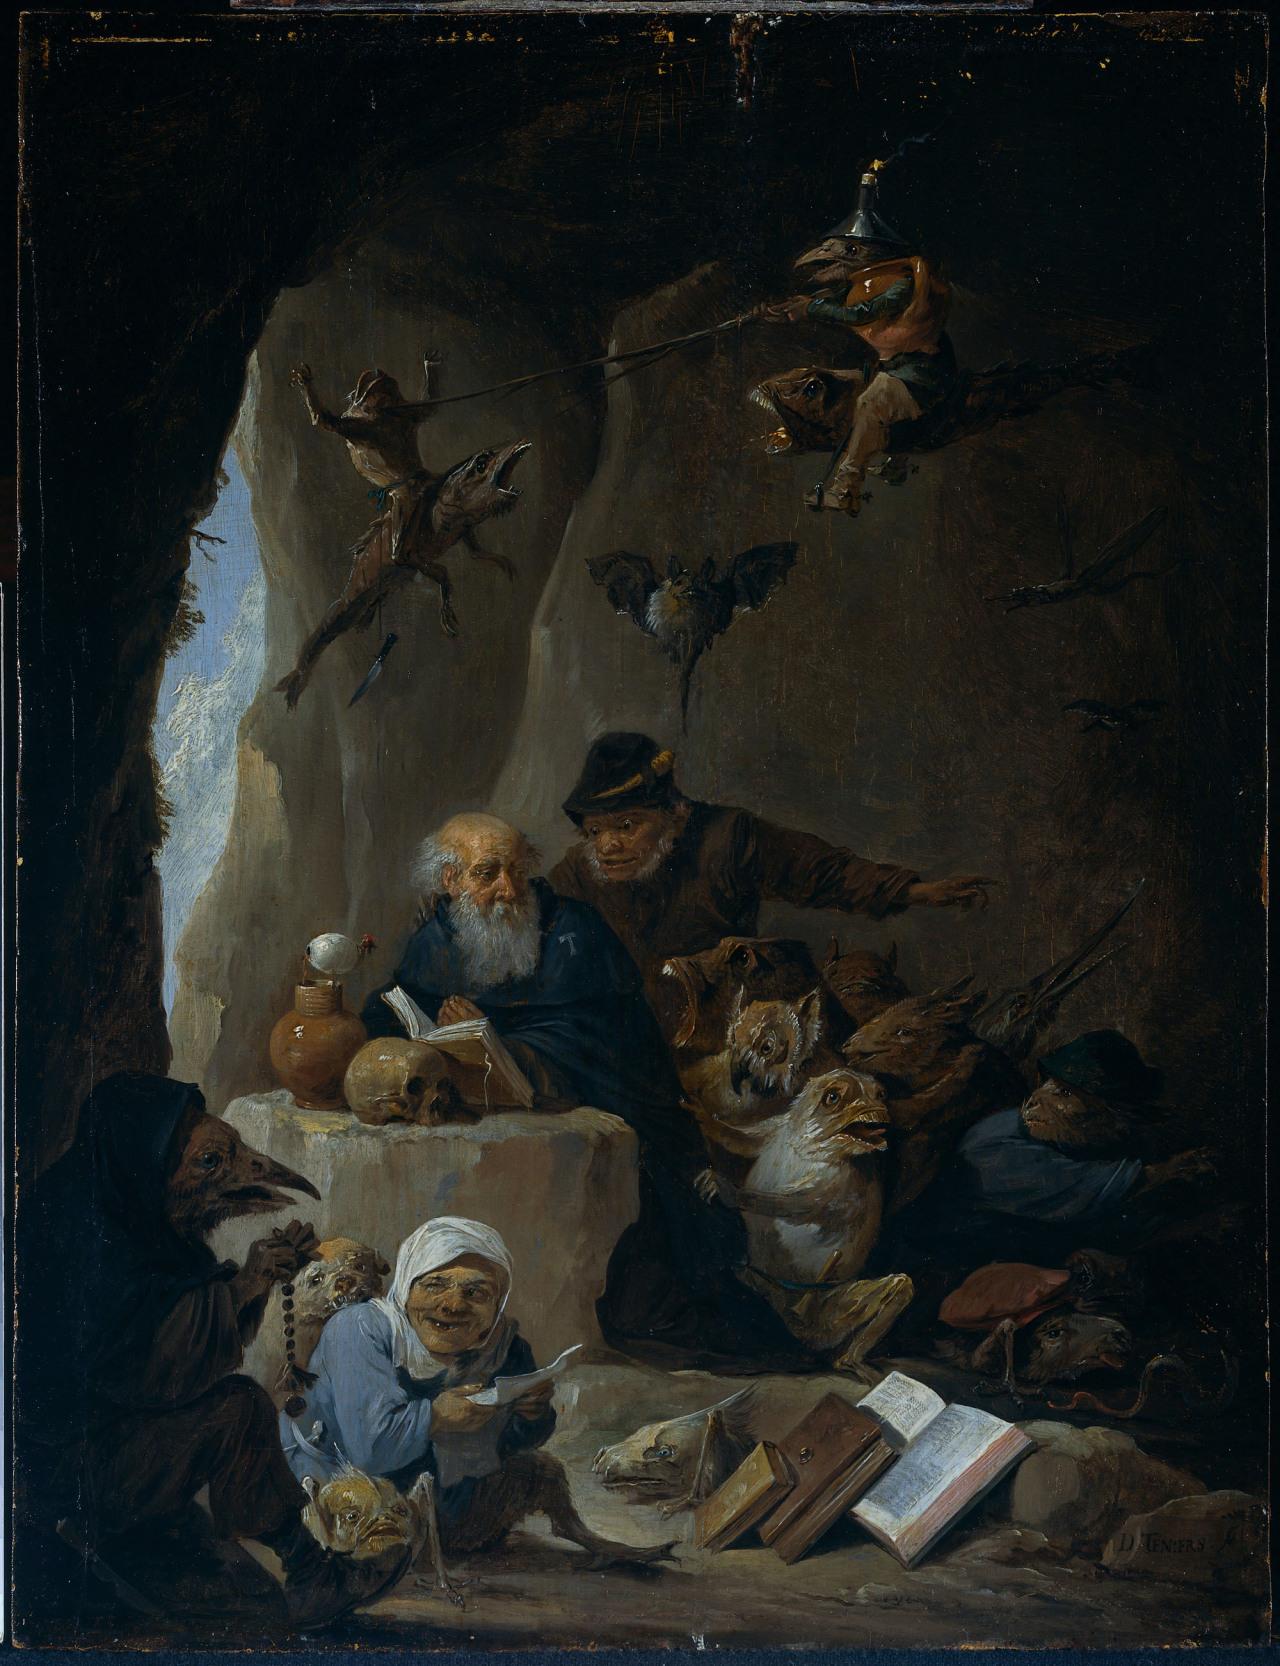 David Teniers II - The Temptation of St. Anthony. 1660 rijksmuseum